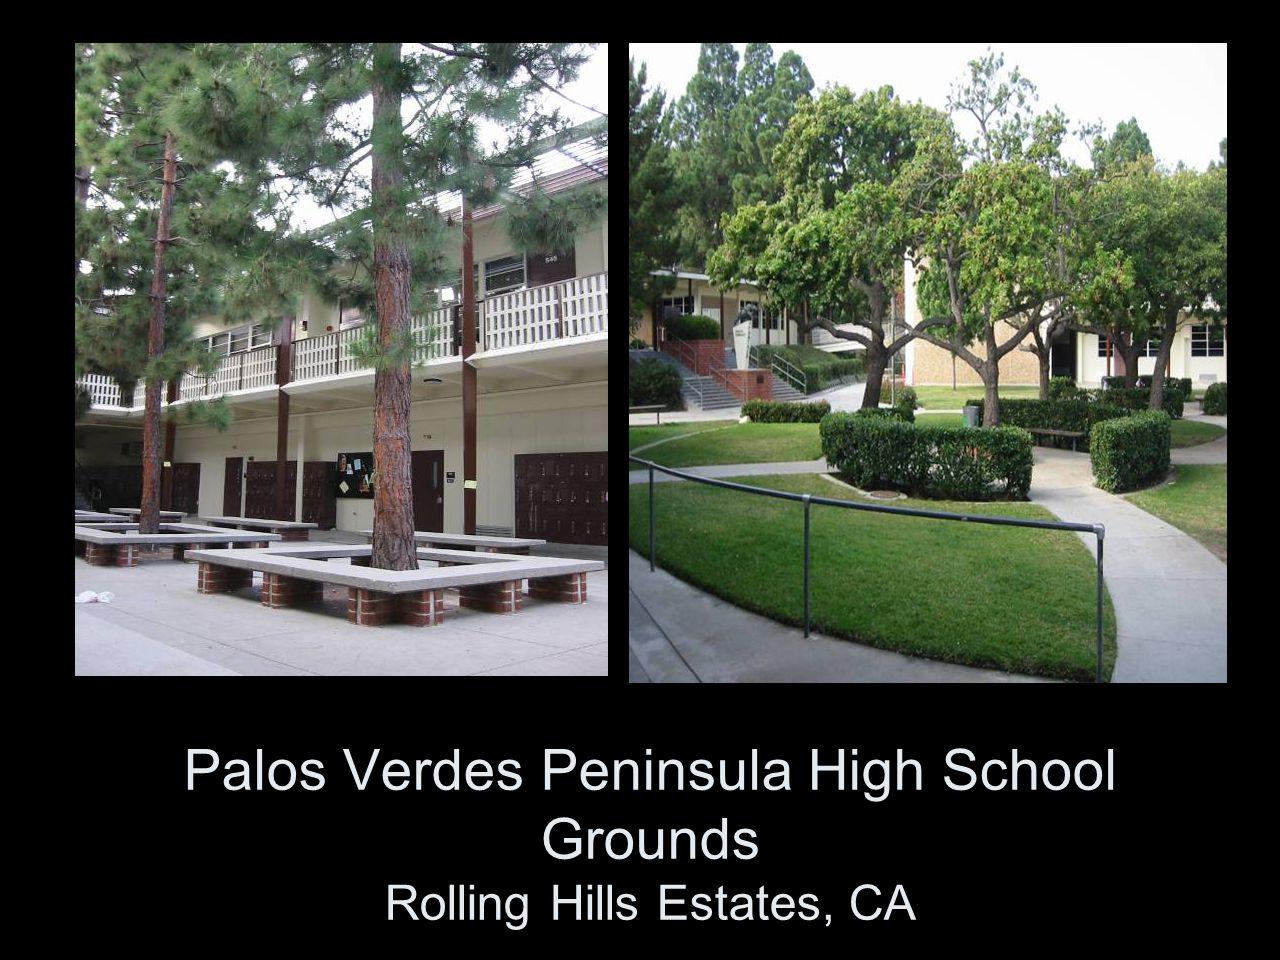 Palos Verdes Peninsula High School Grounds Rolling Hills Estates, CA